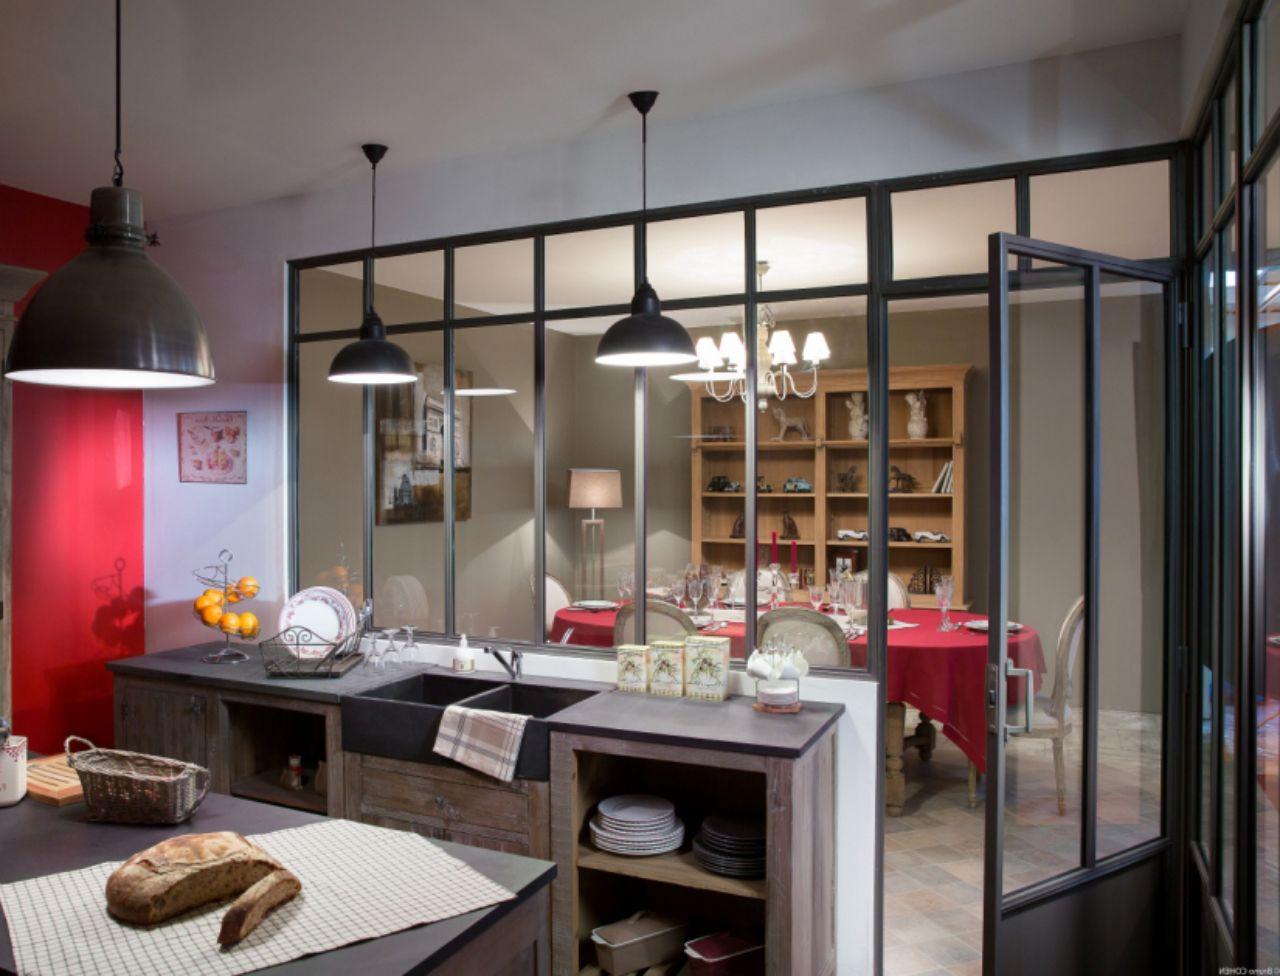 Cuisine avec verri re kitchen glass kitchen semi open - Petite cuisine amenagee pas cher ...